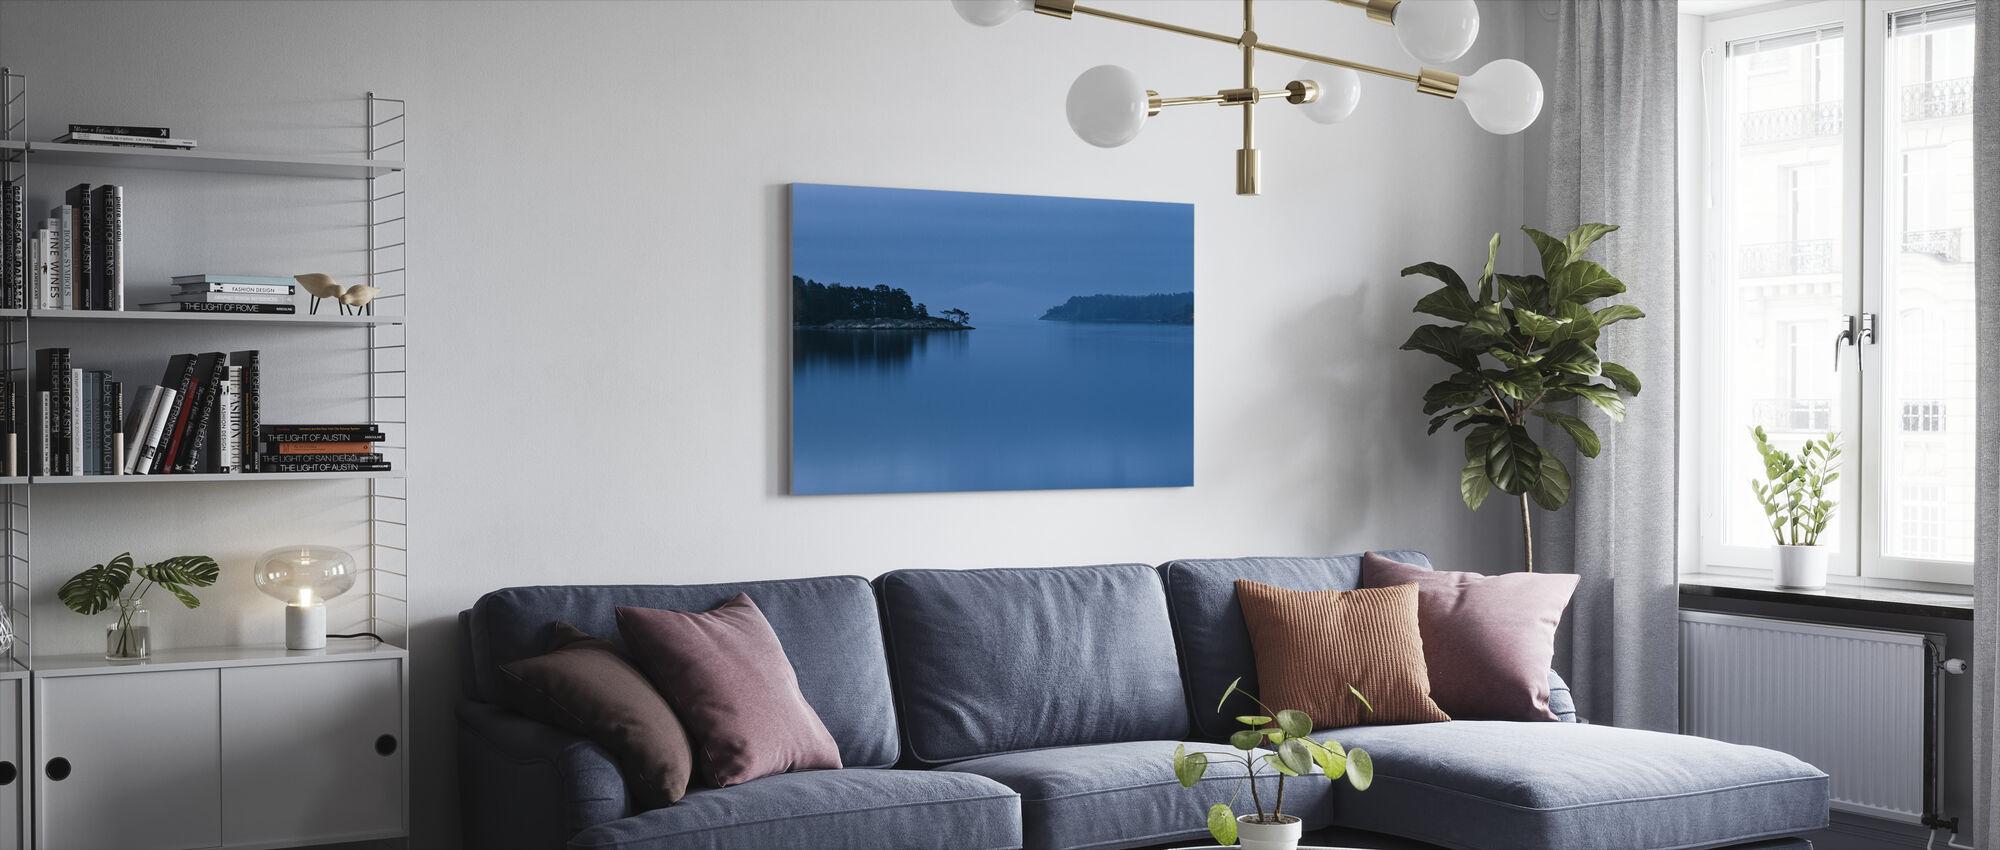 Skymning i Stockholms skärgård - Canvastavla - Vardagsrum